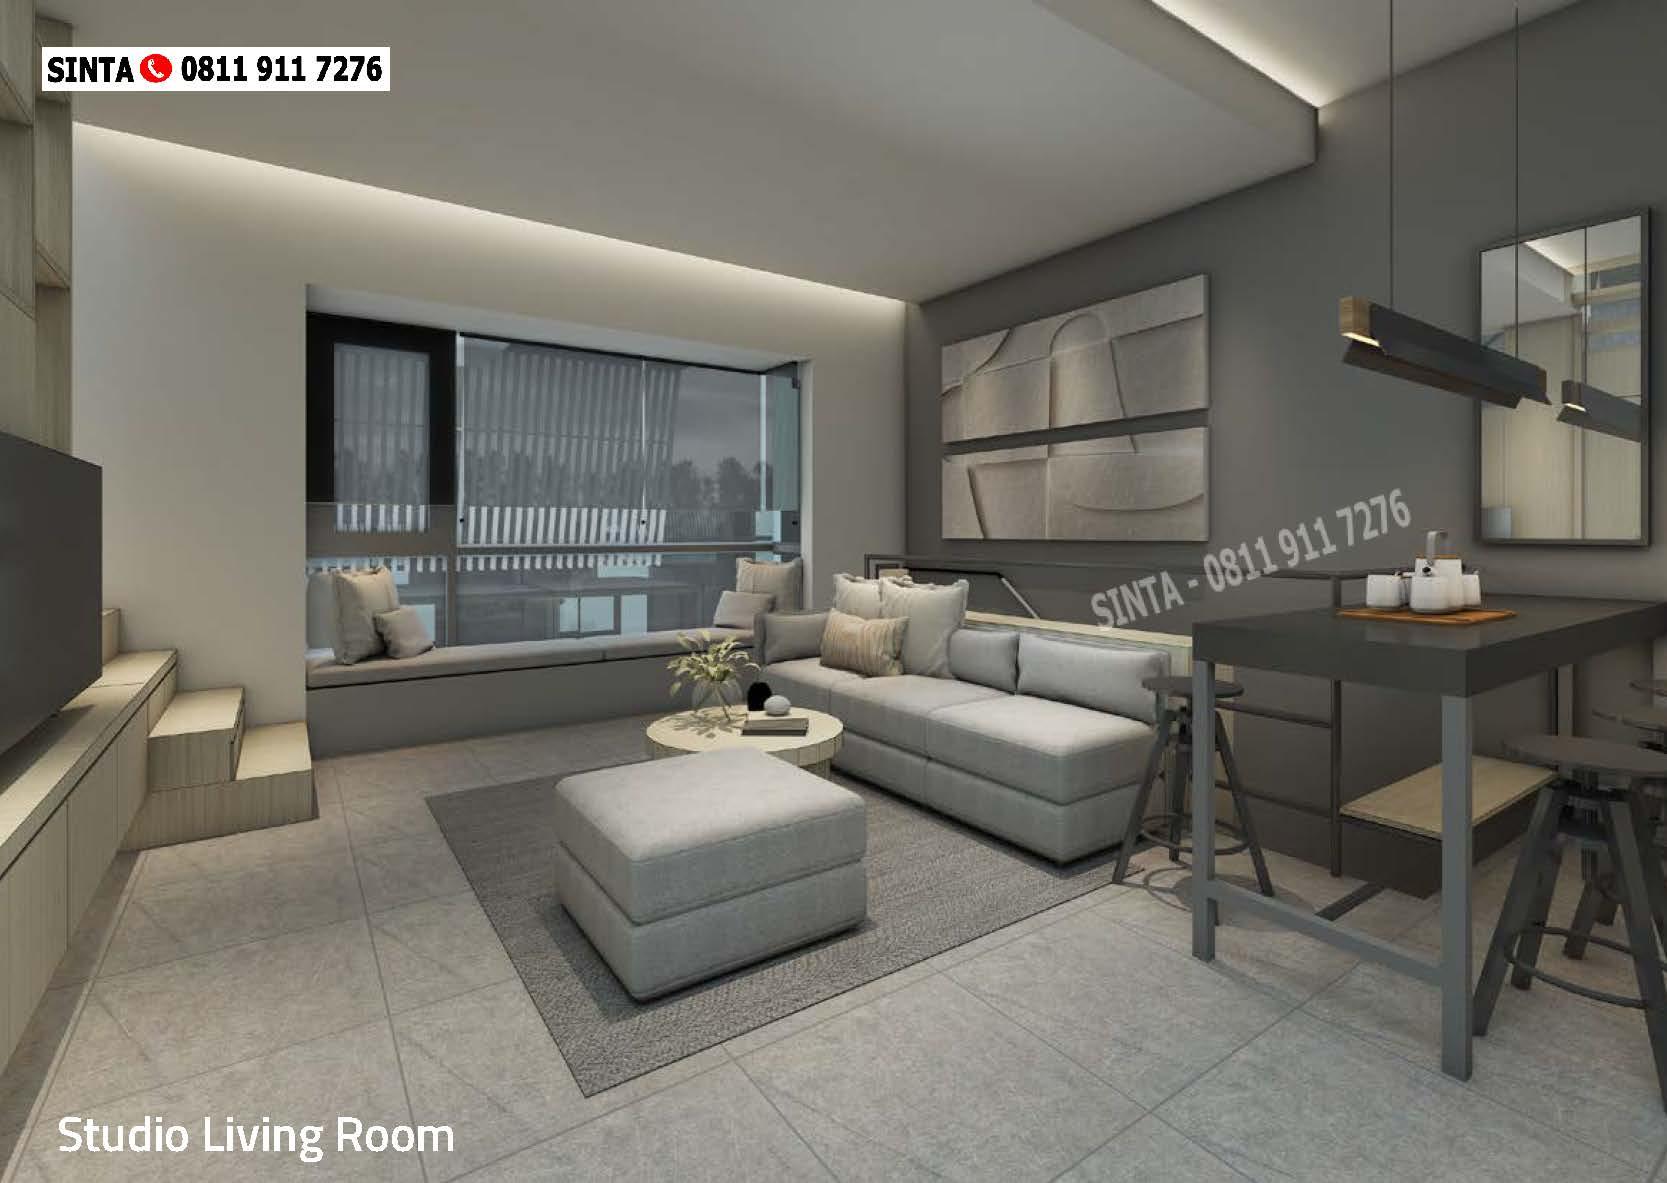 Impresahaus Tabebuya Bsd City Studio Living Room